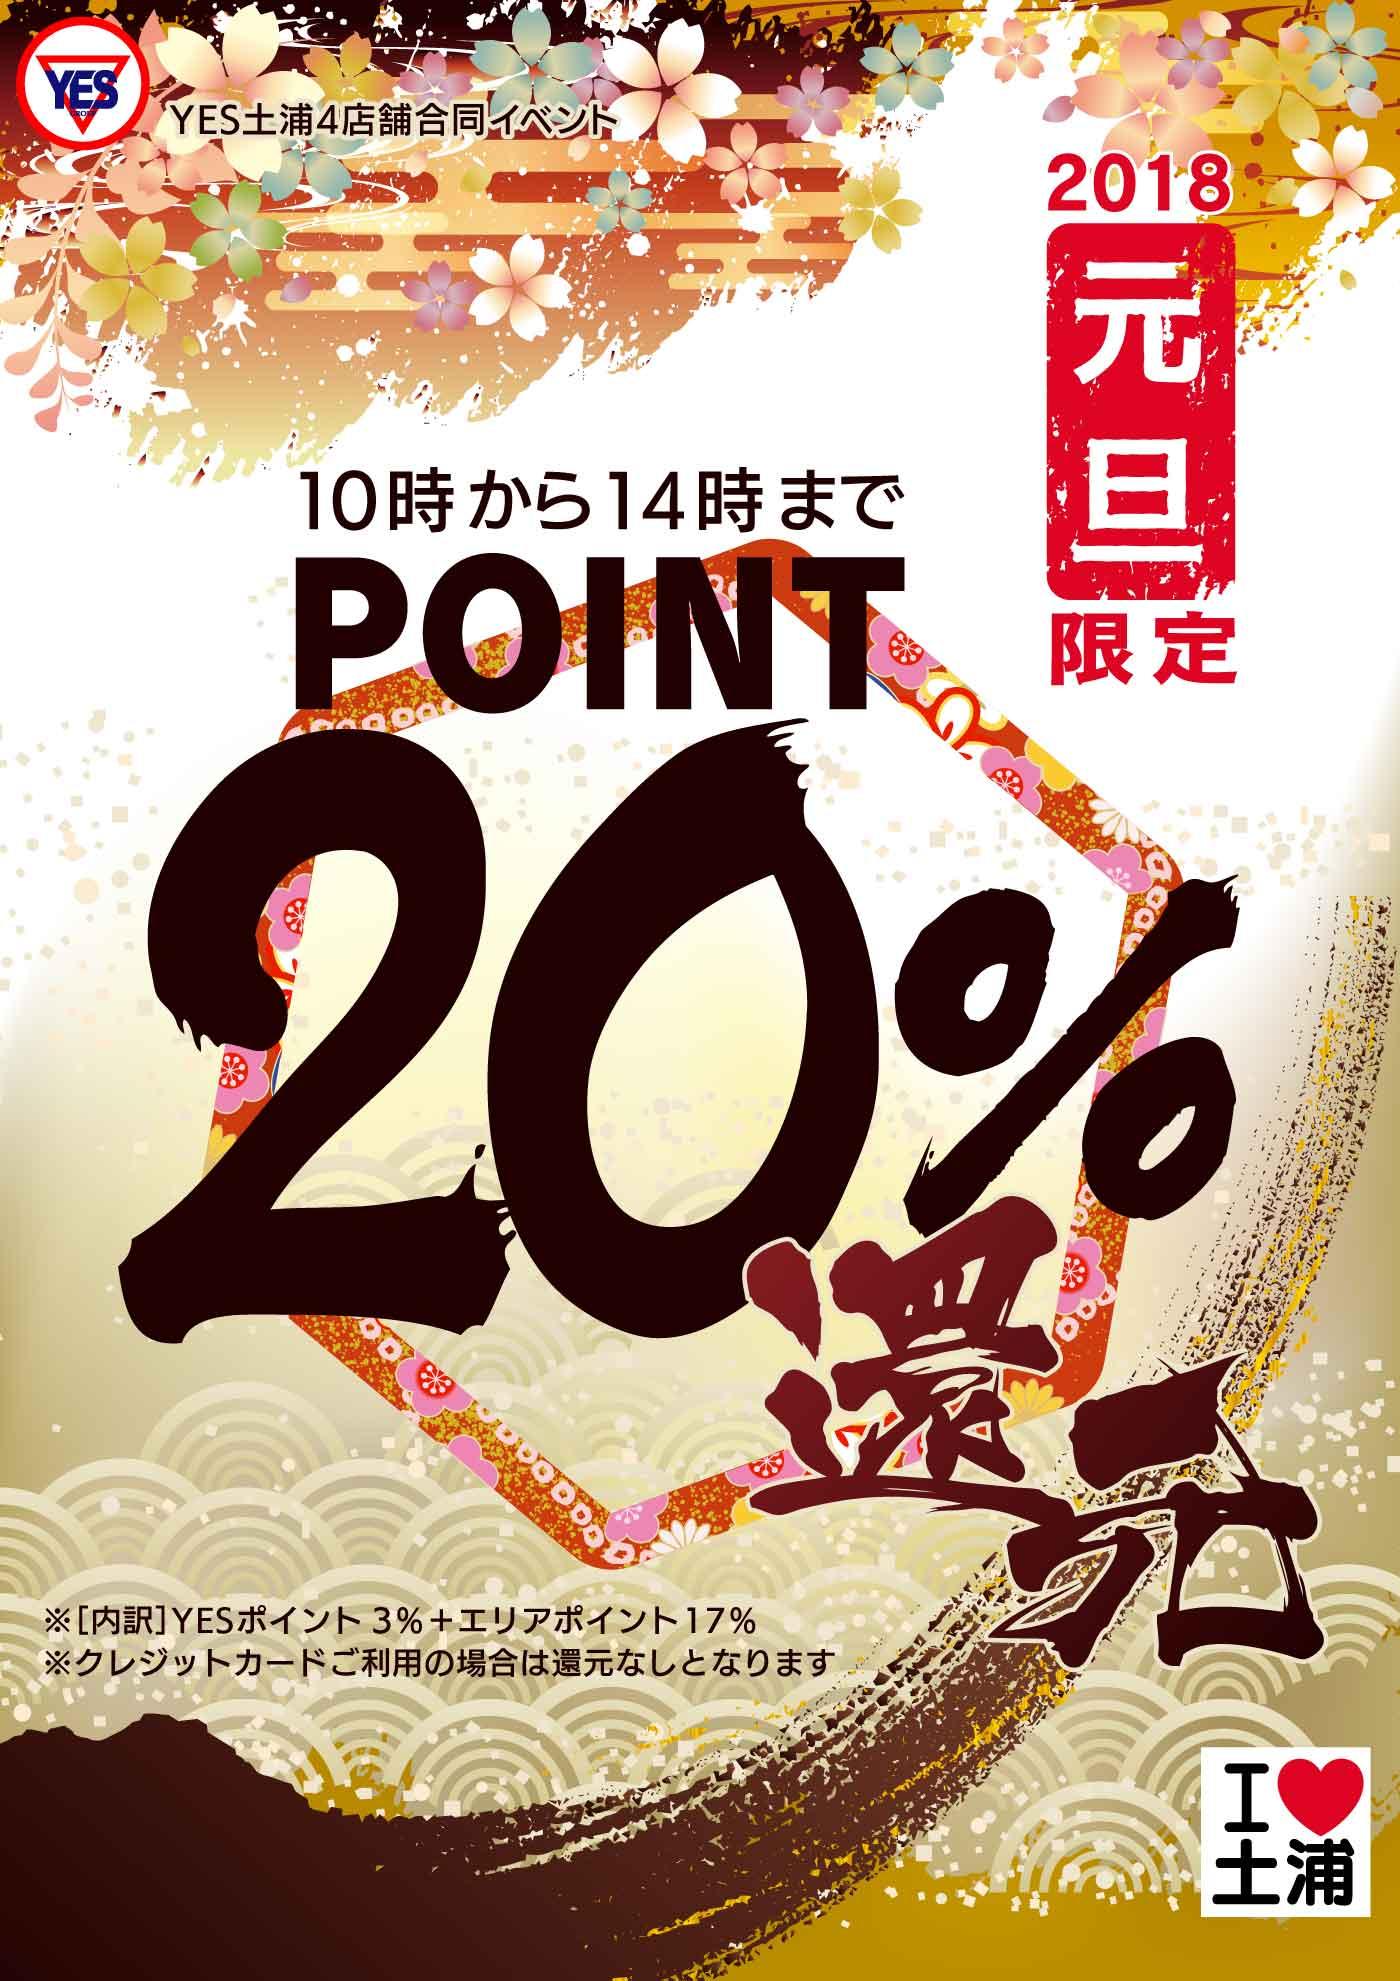 YES土浦4店舗合同お正月20%ポイント還元イベント!!